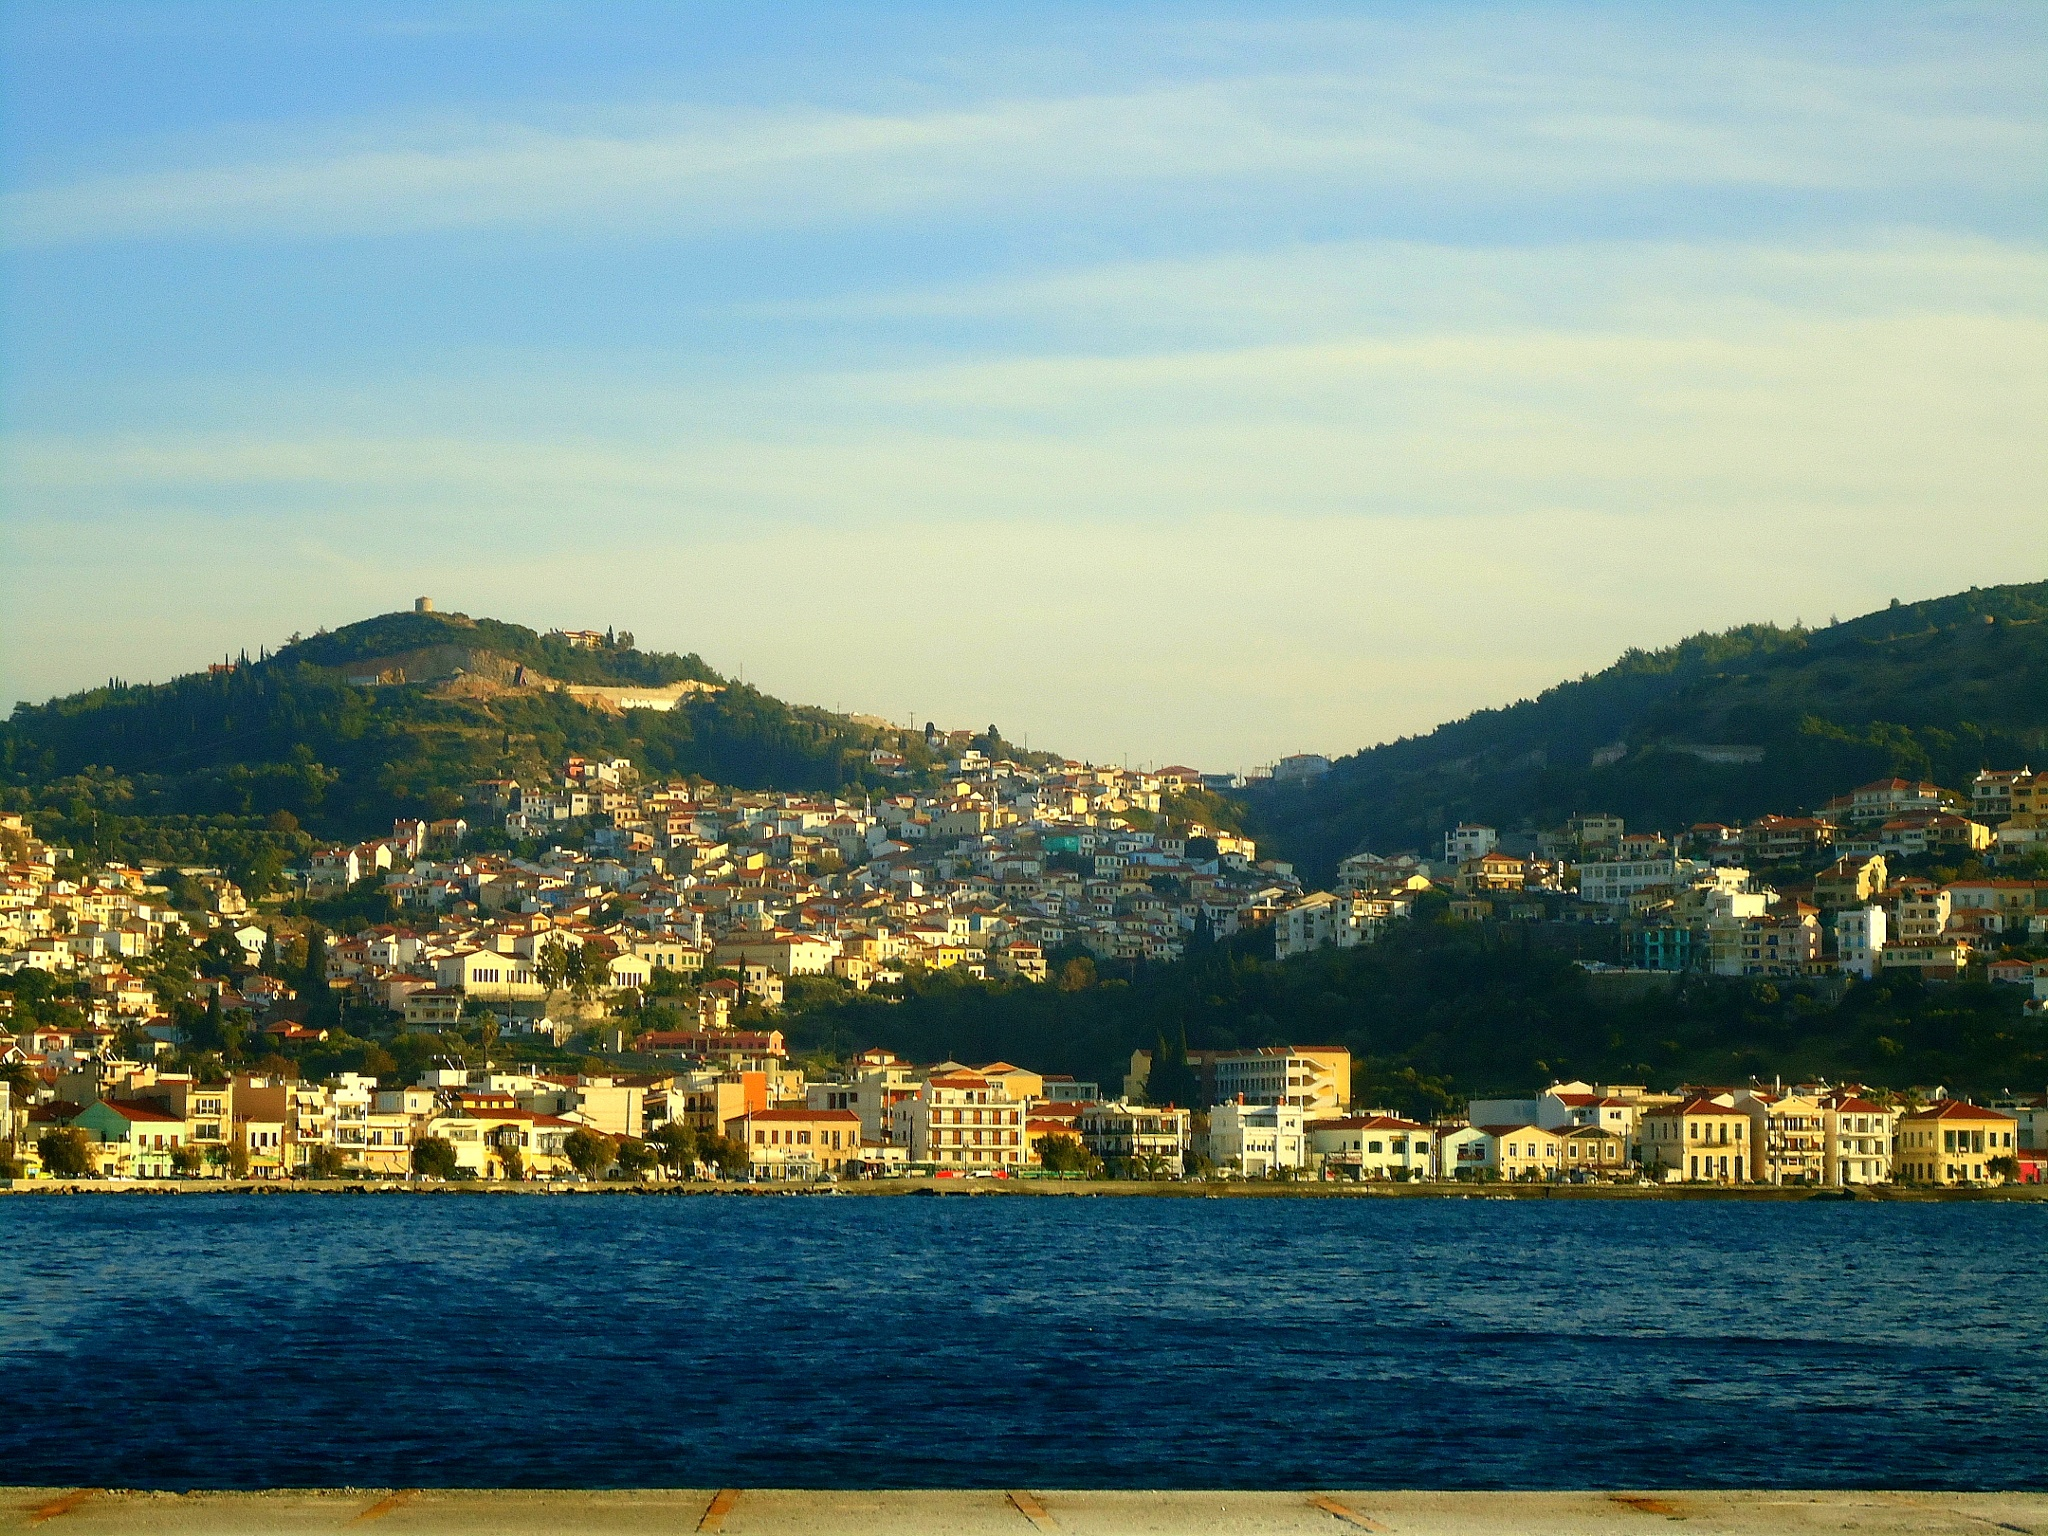 Samos Island by NIHAL